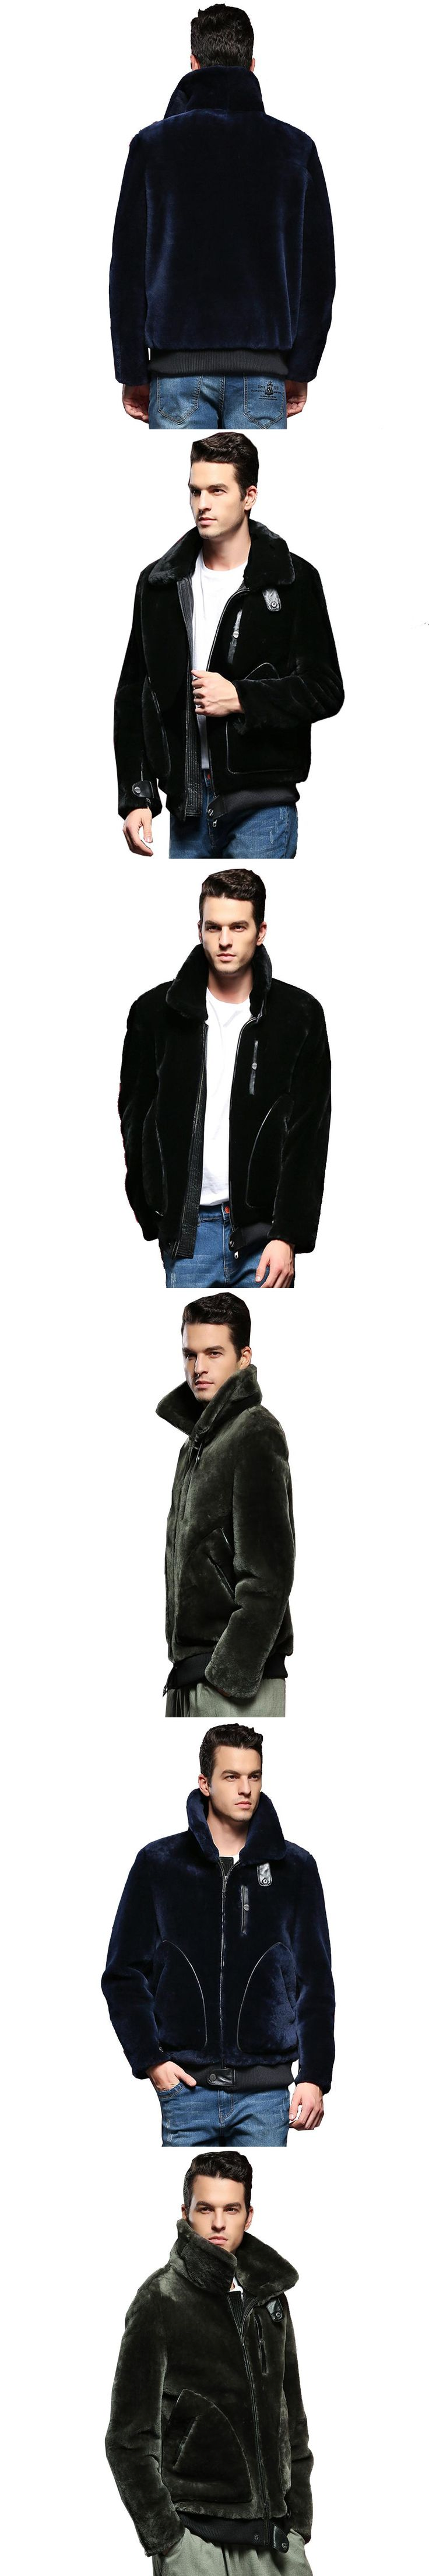 Quality Guaranteed Real Sheepskin Fur Coat Genuine Leather Male Formal Thick Winter Clothing Sheepskin Jacket Men Fur Outwear